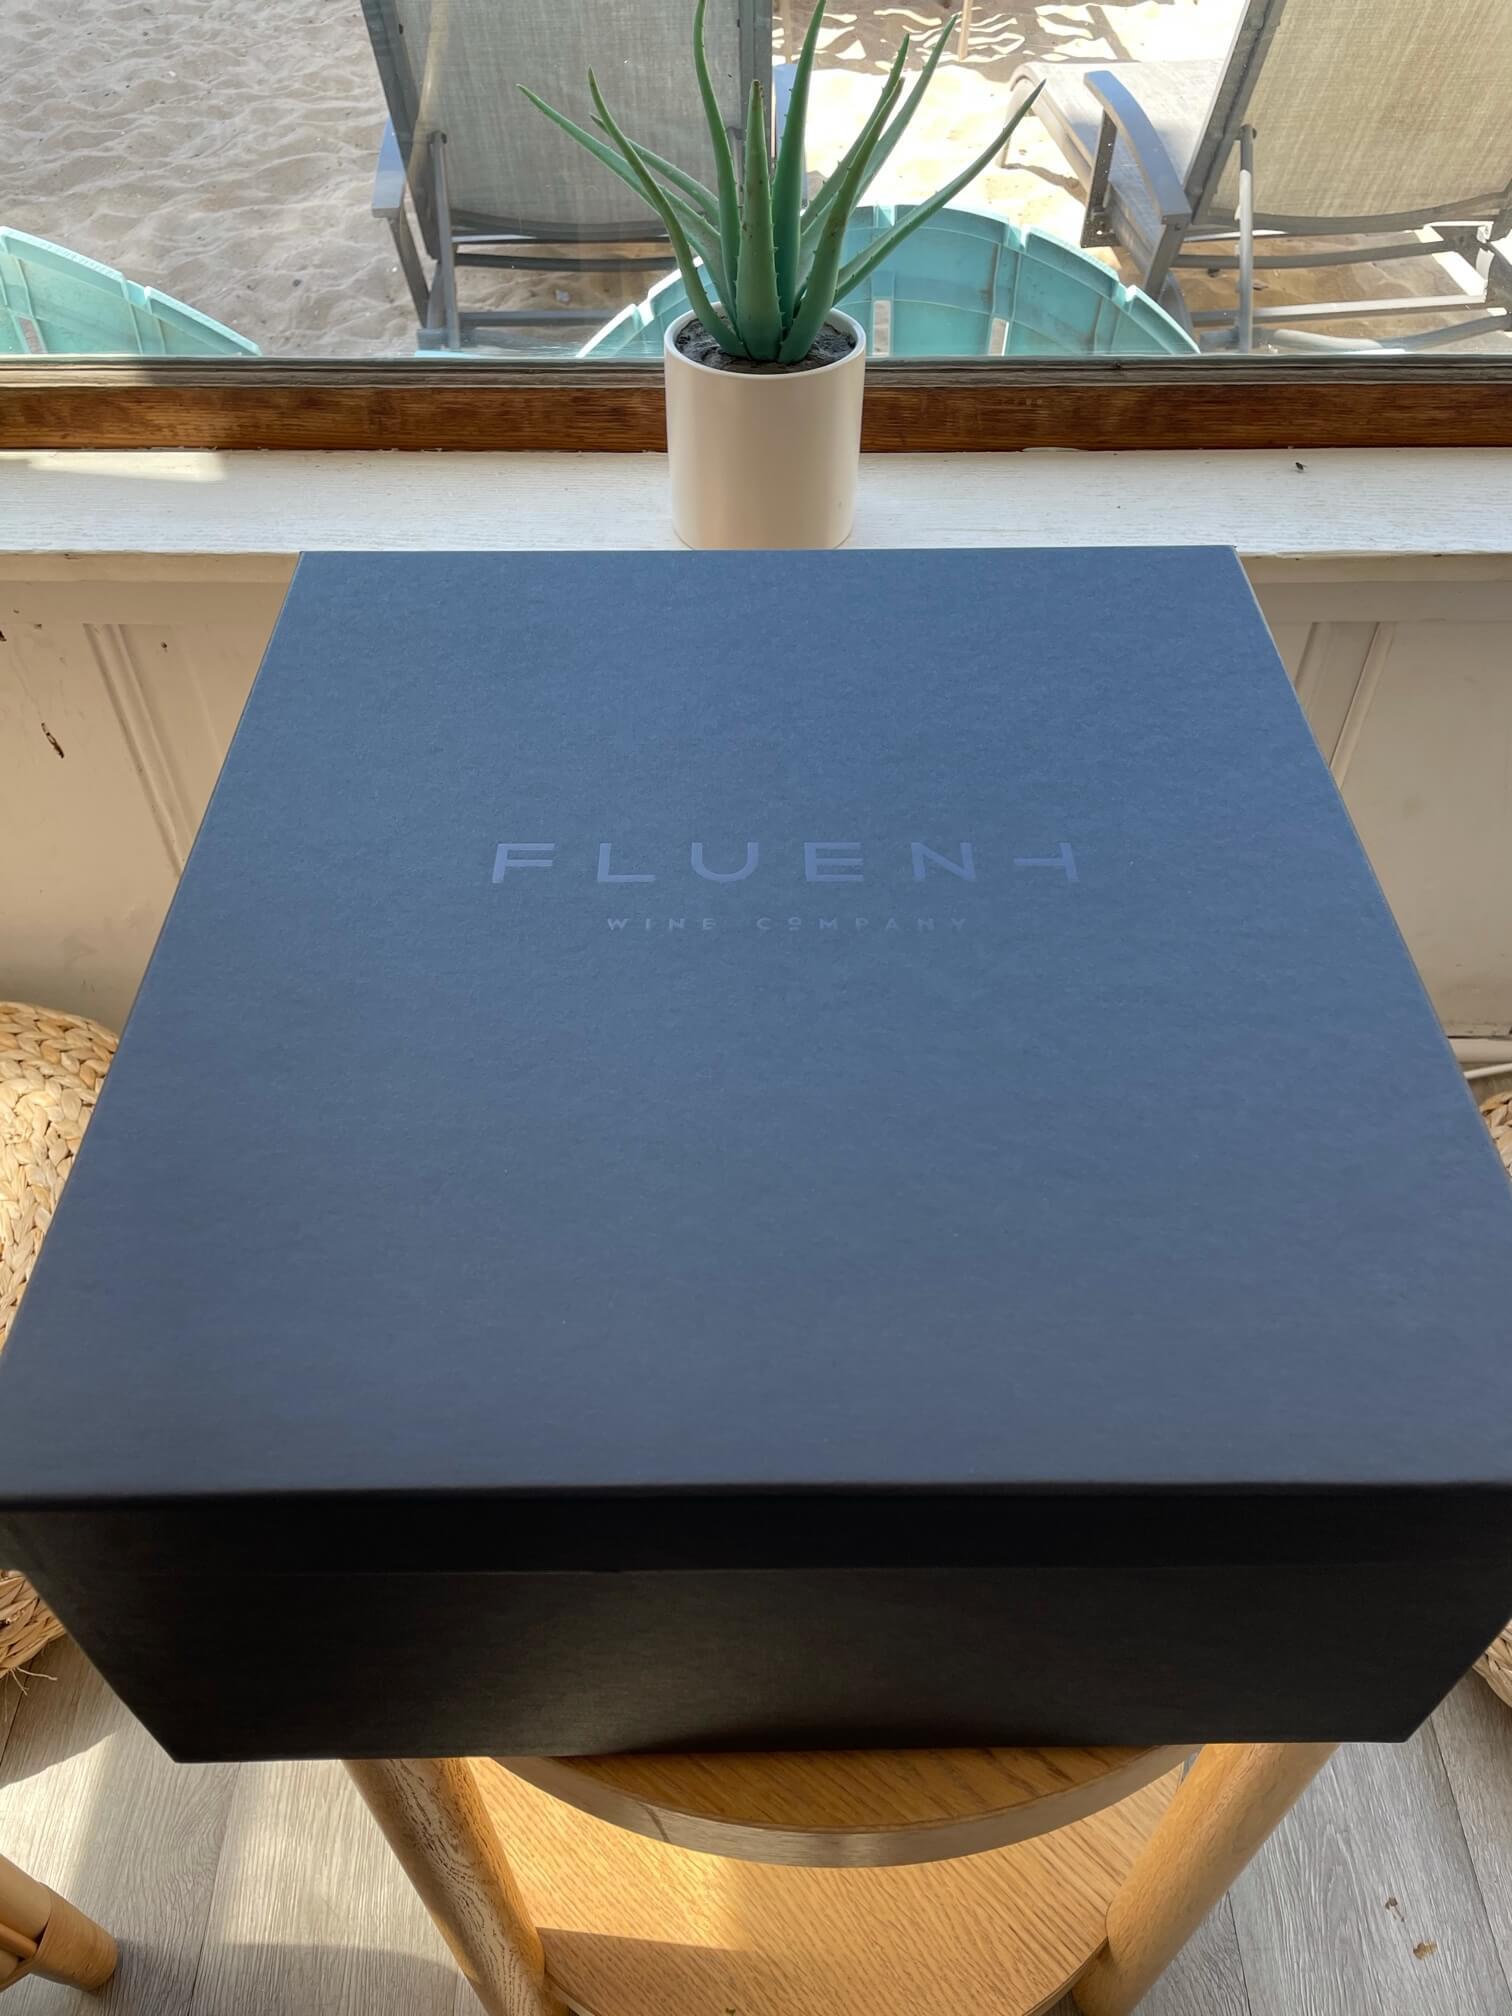 boxes for wine bottles, presentation packaging